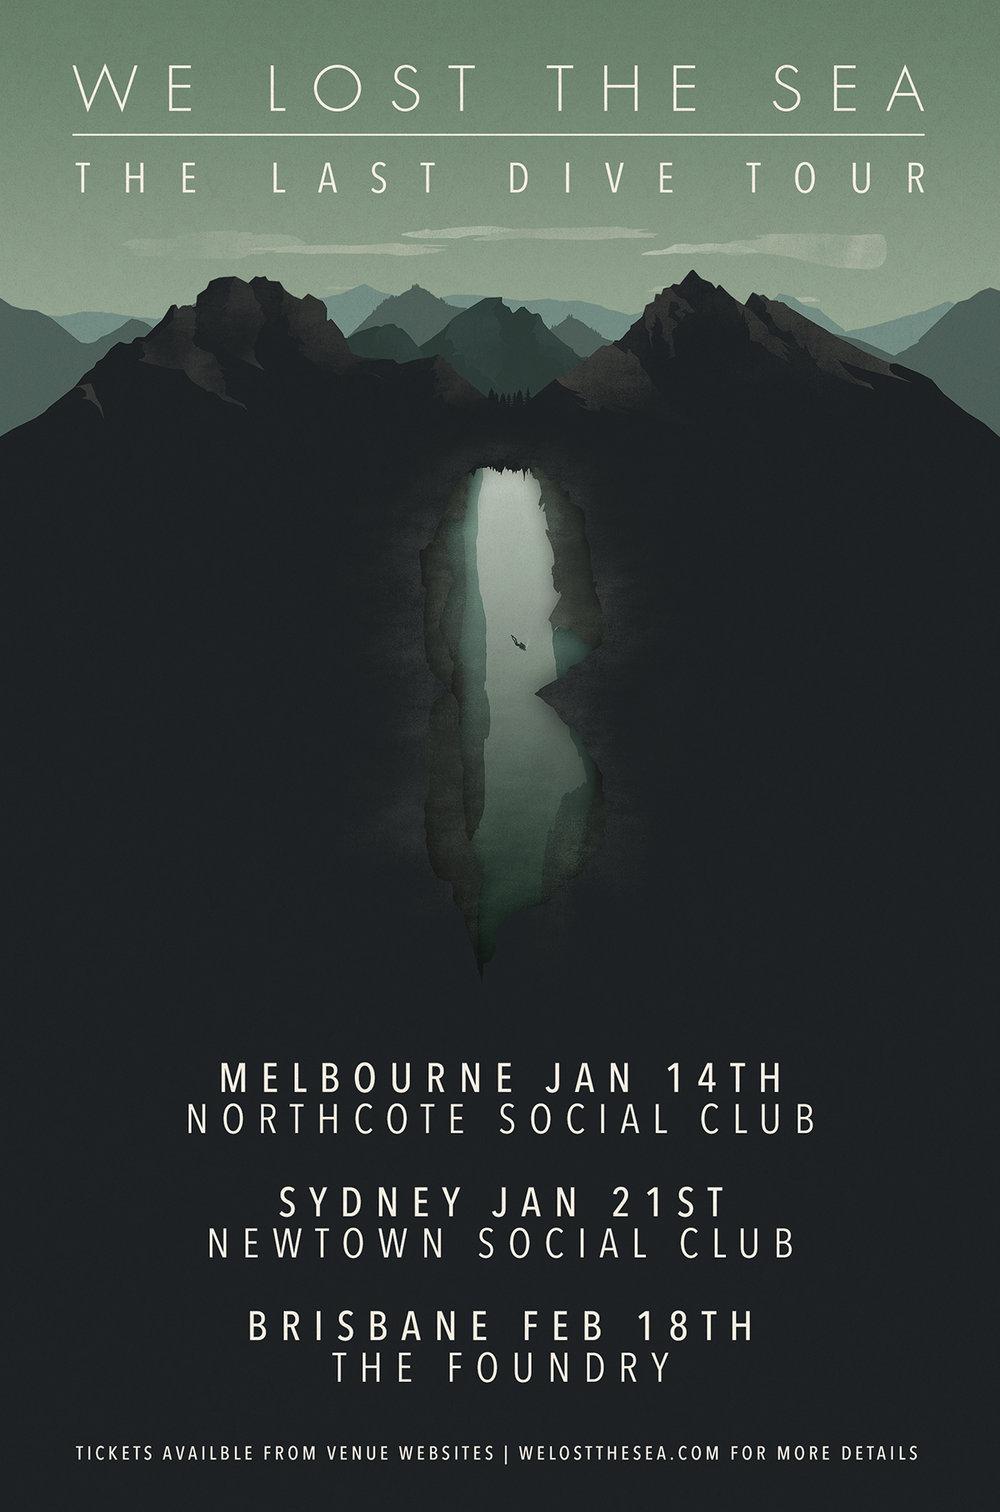 WLTS Diver tour poster_web.jpg